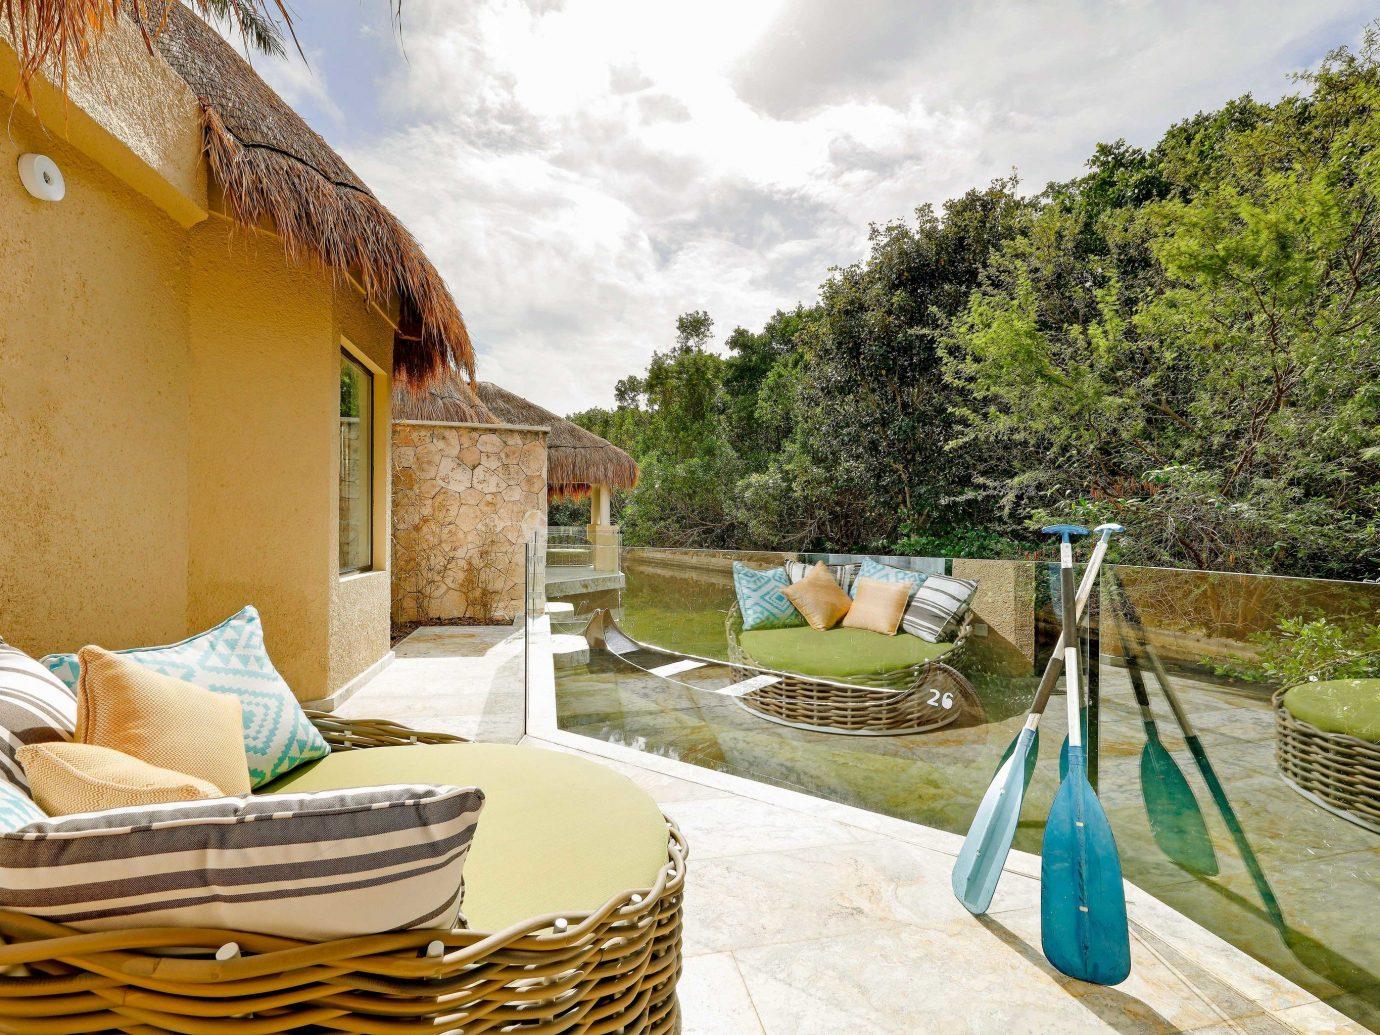 All-inclusive All-Inclusive Resorts Mexico Riviera Maya, Mexico property real estate estate Villa Resort home house outdoor structure hacienda vacation leisure